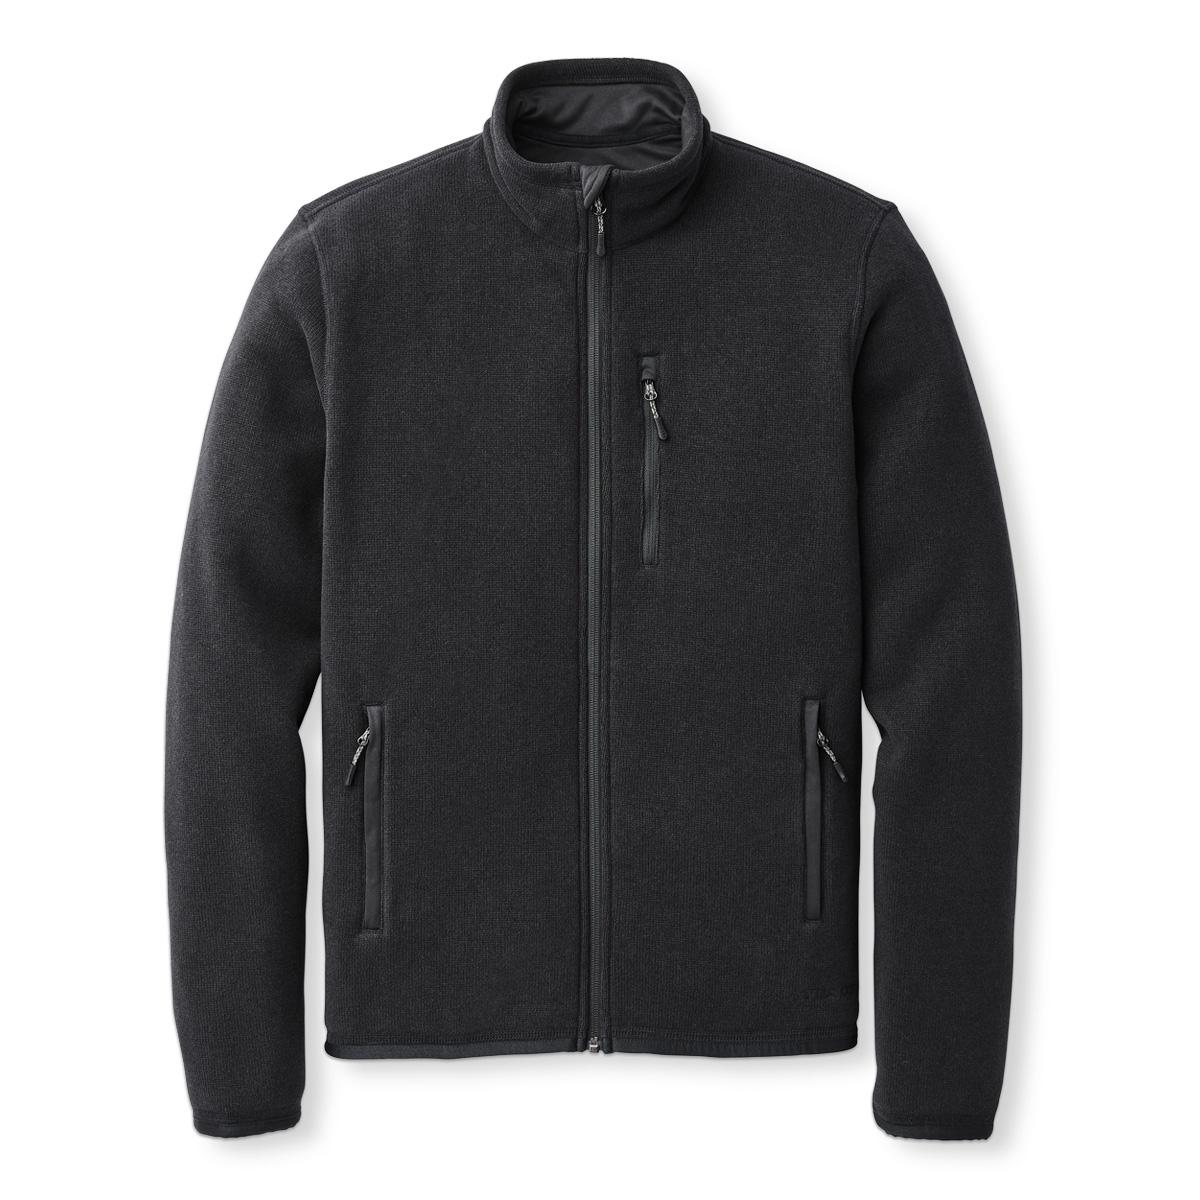 Filson Ridgeway Fleece Jacket Black